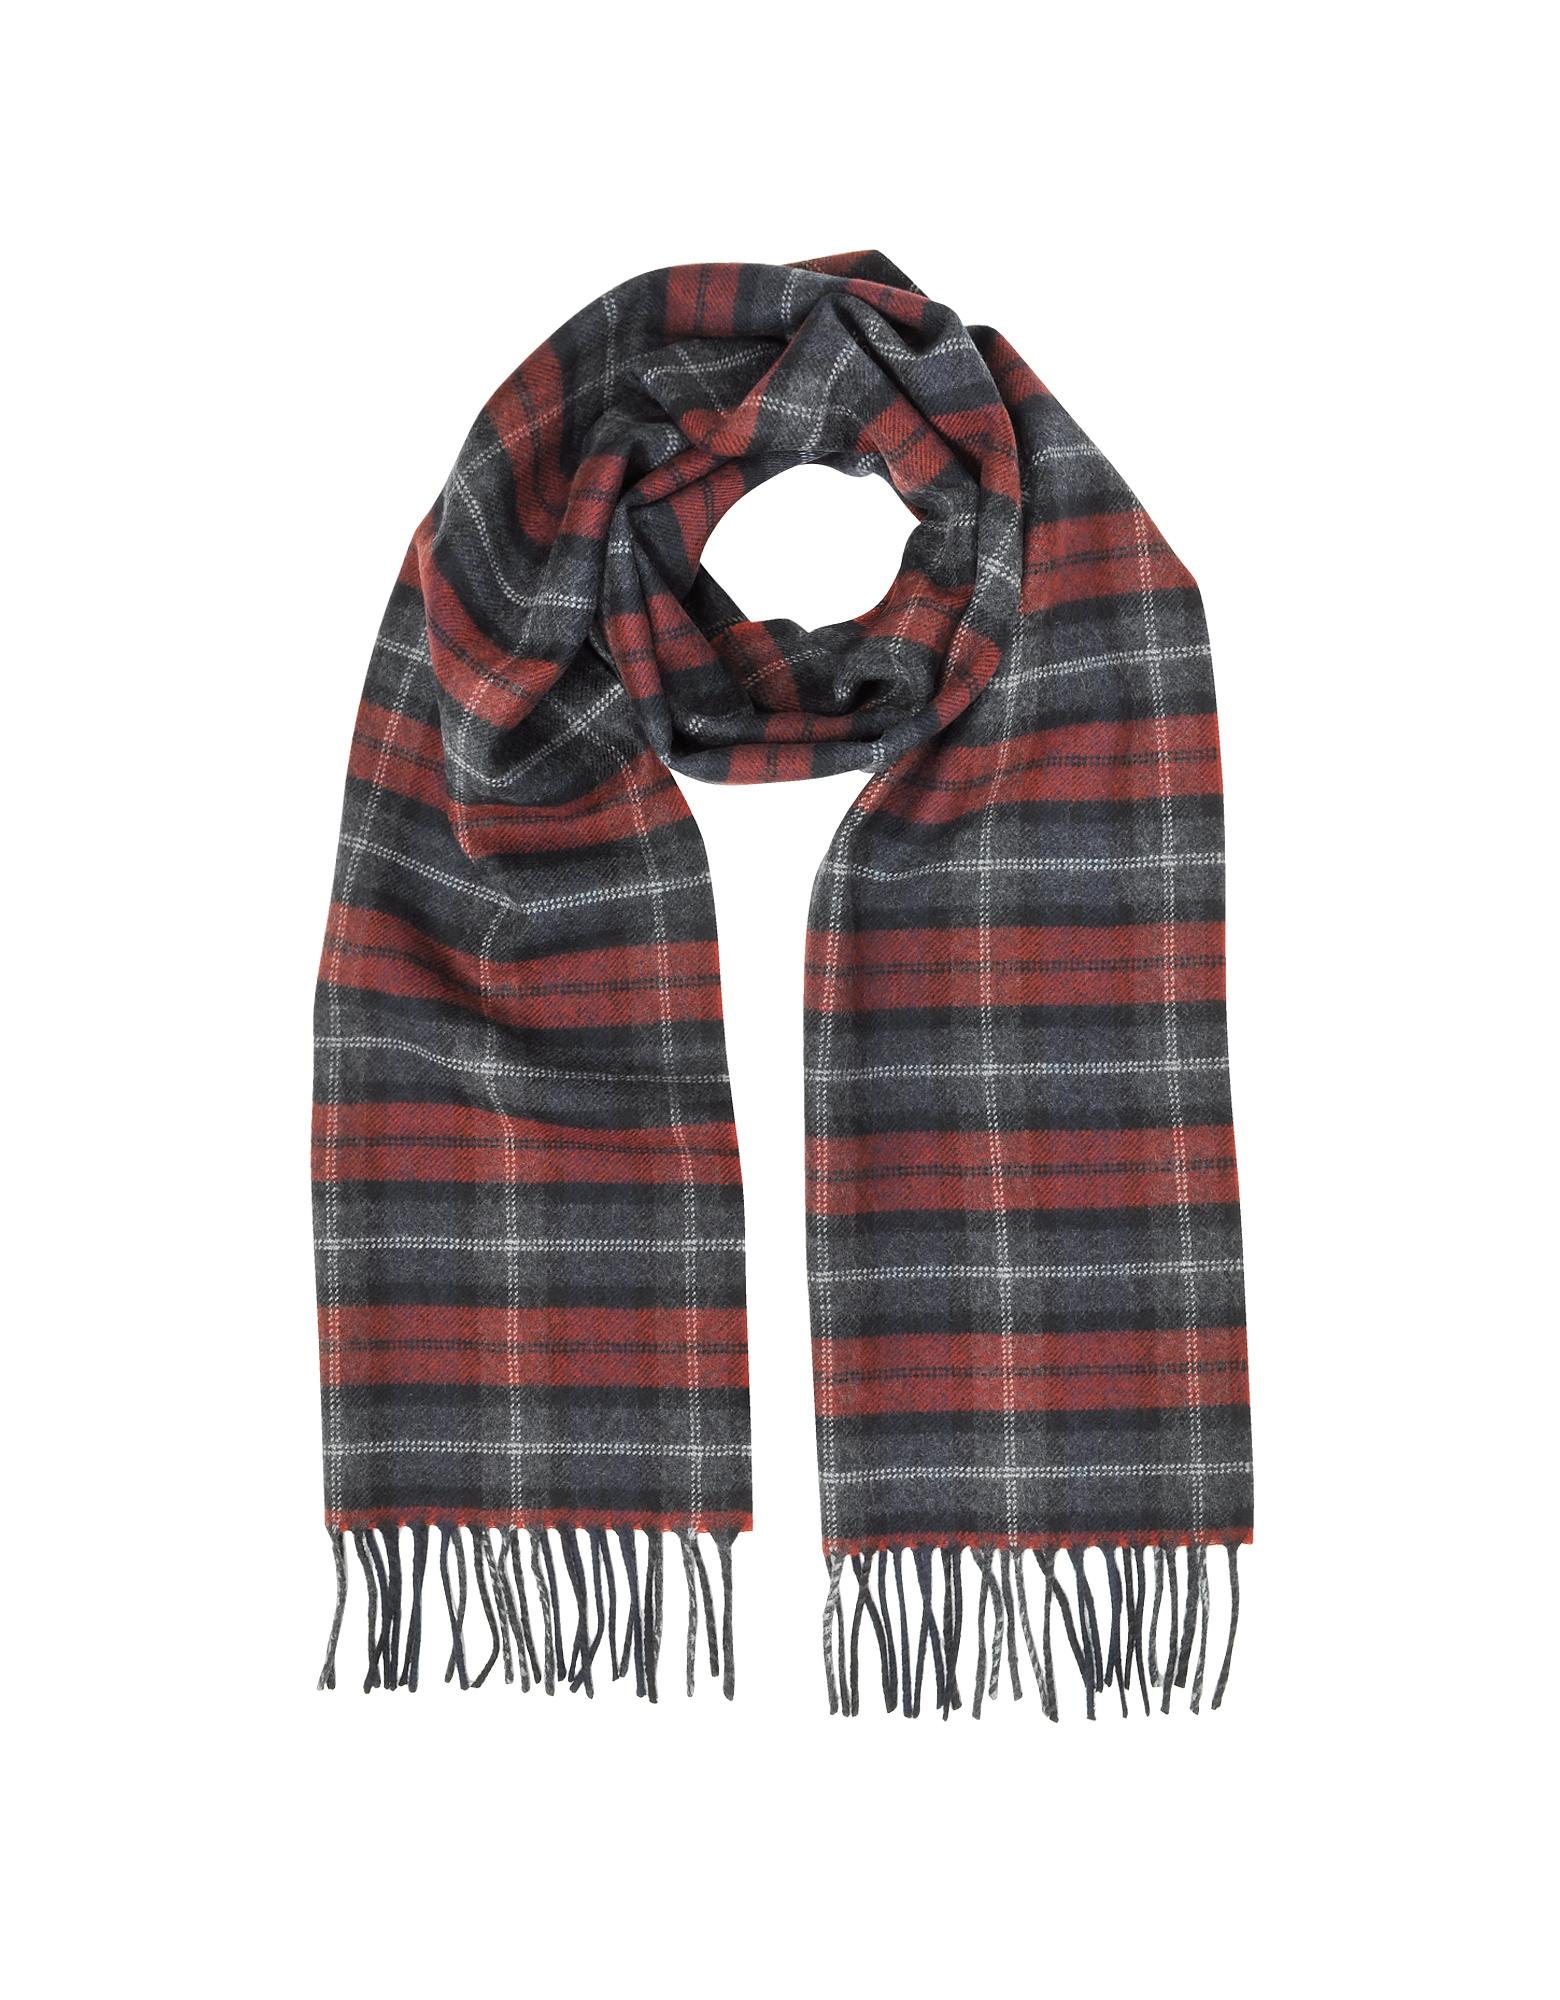 Lanvin Men's Scarves, Tartan Solid Wool Fringed Scarf